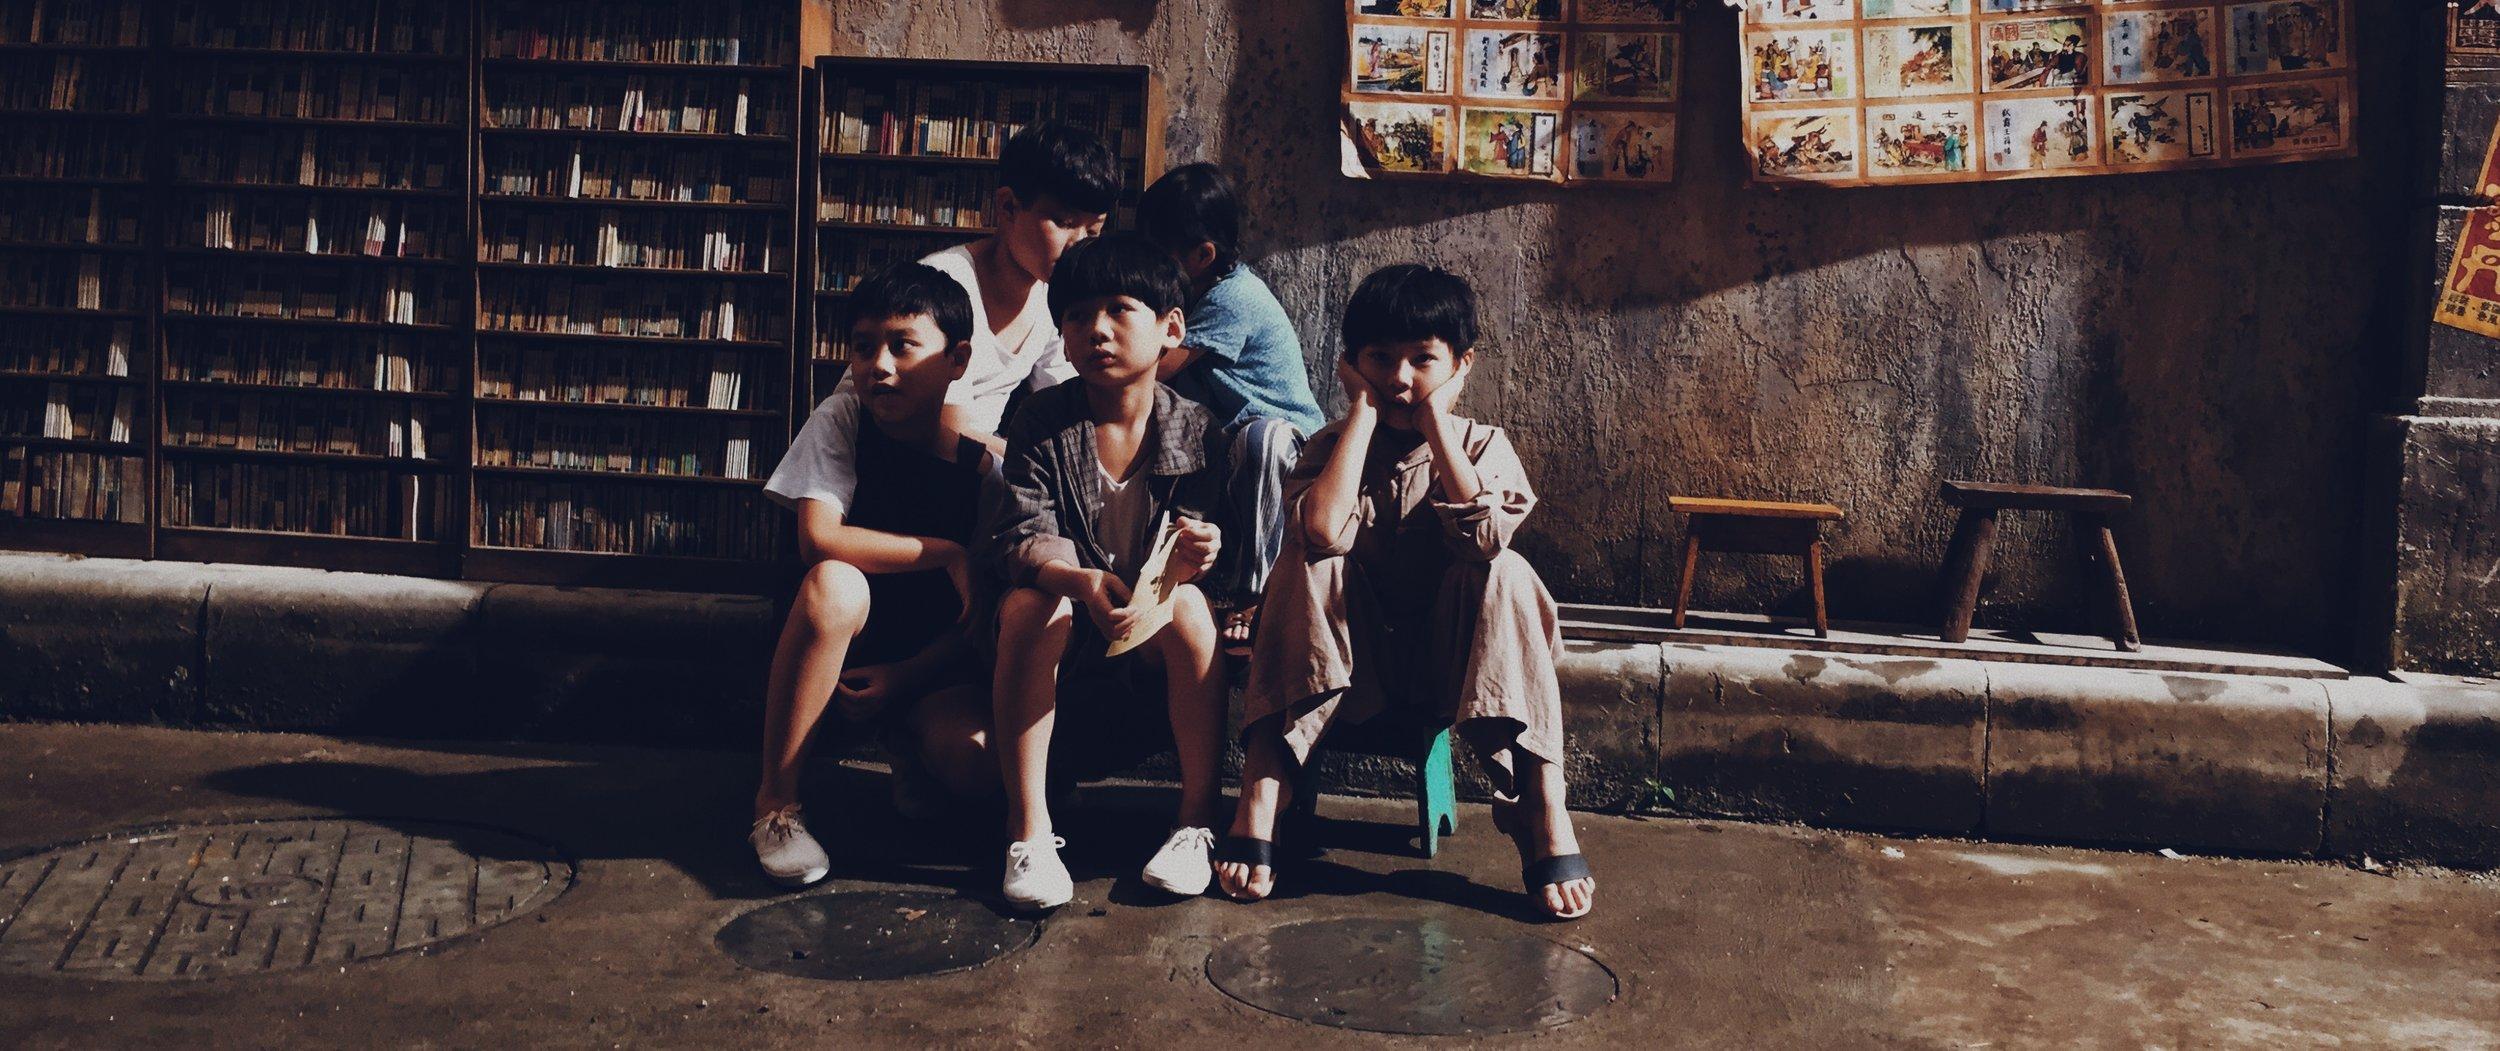 Feng Ge and his gang